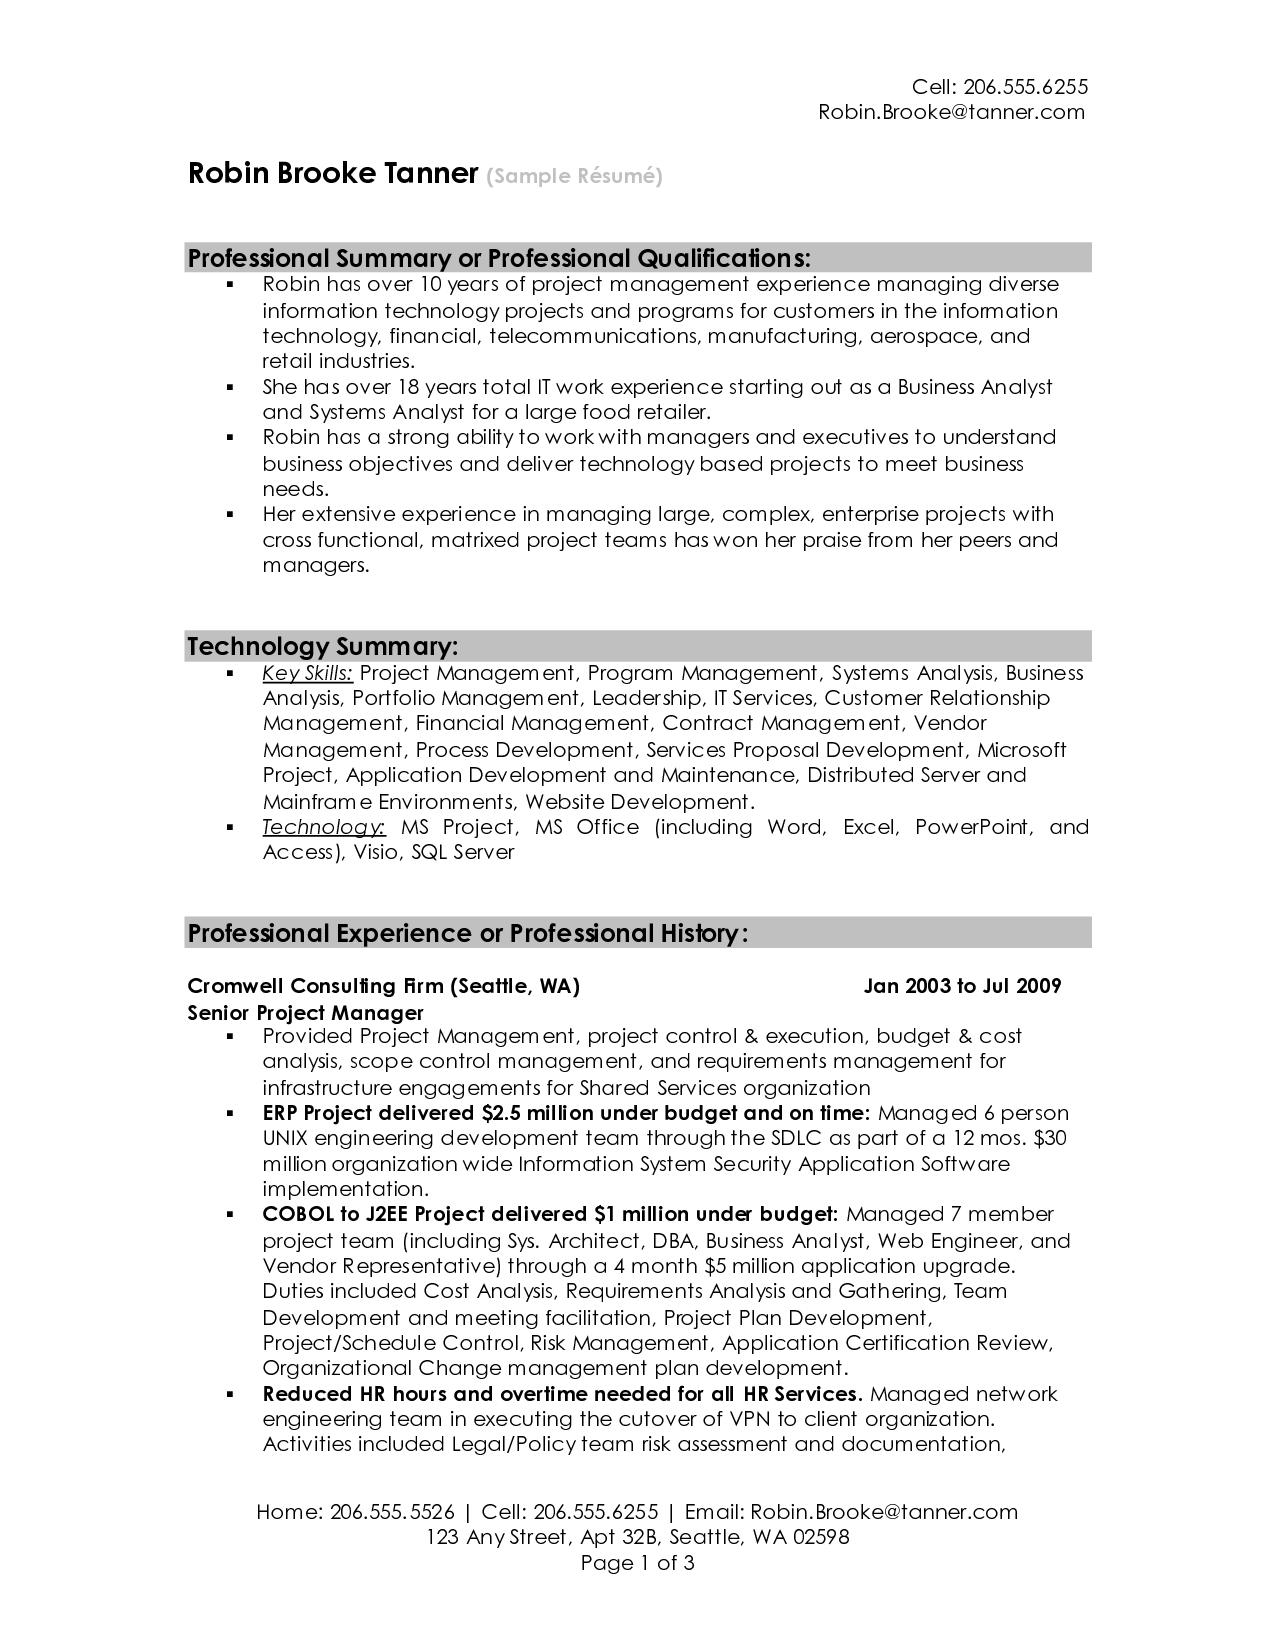 resume summary examples